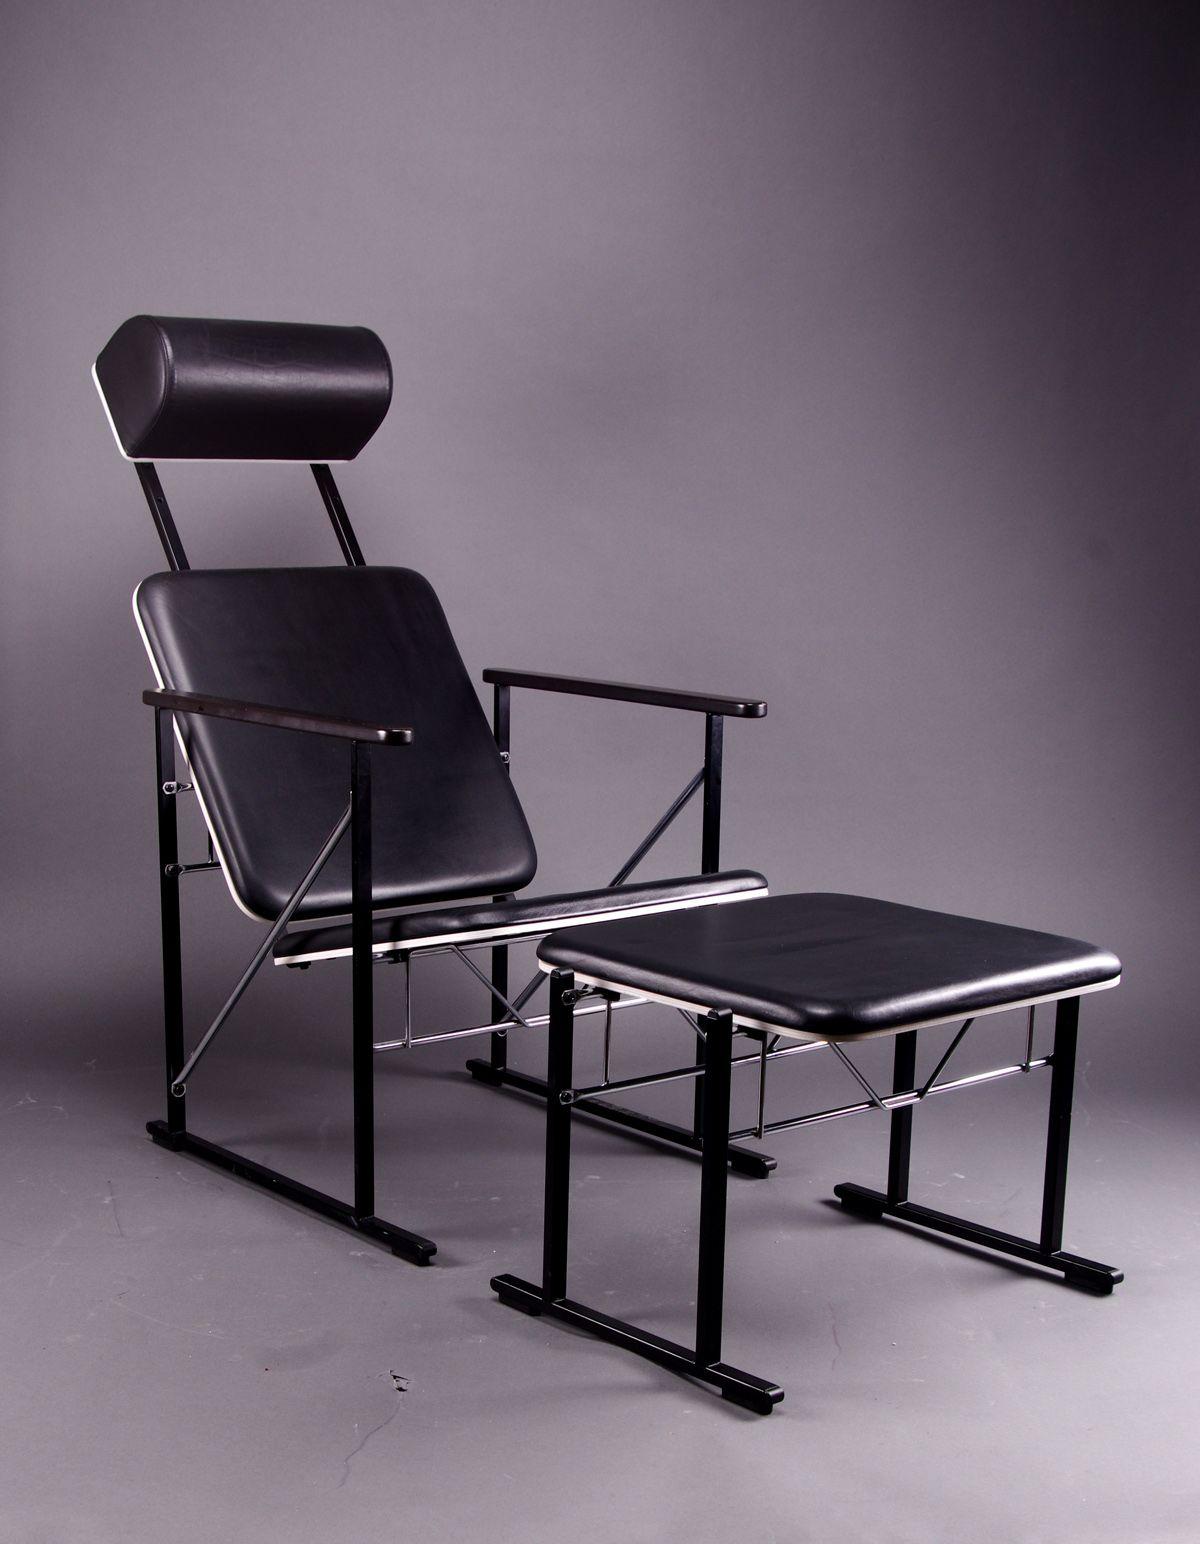 Yrj 246 Kukkapuro Model Avarte A505 1960s Furniture Design